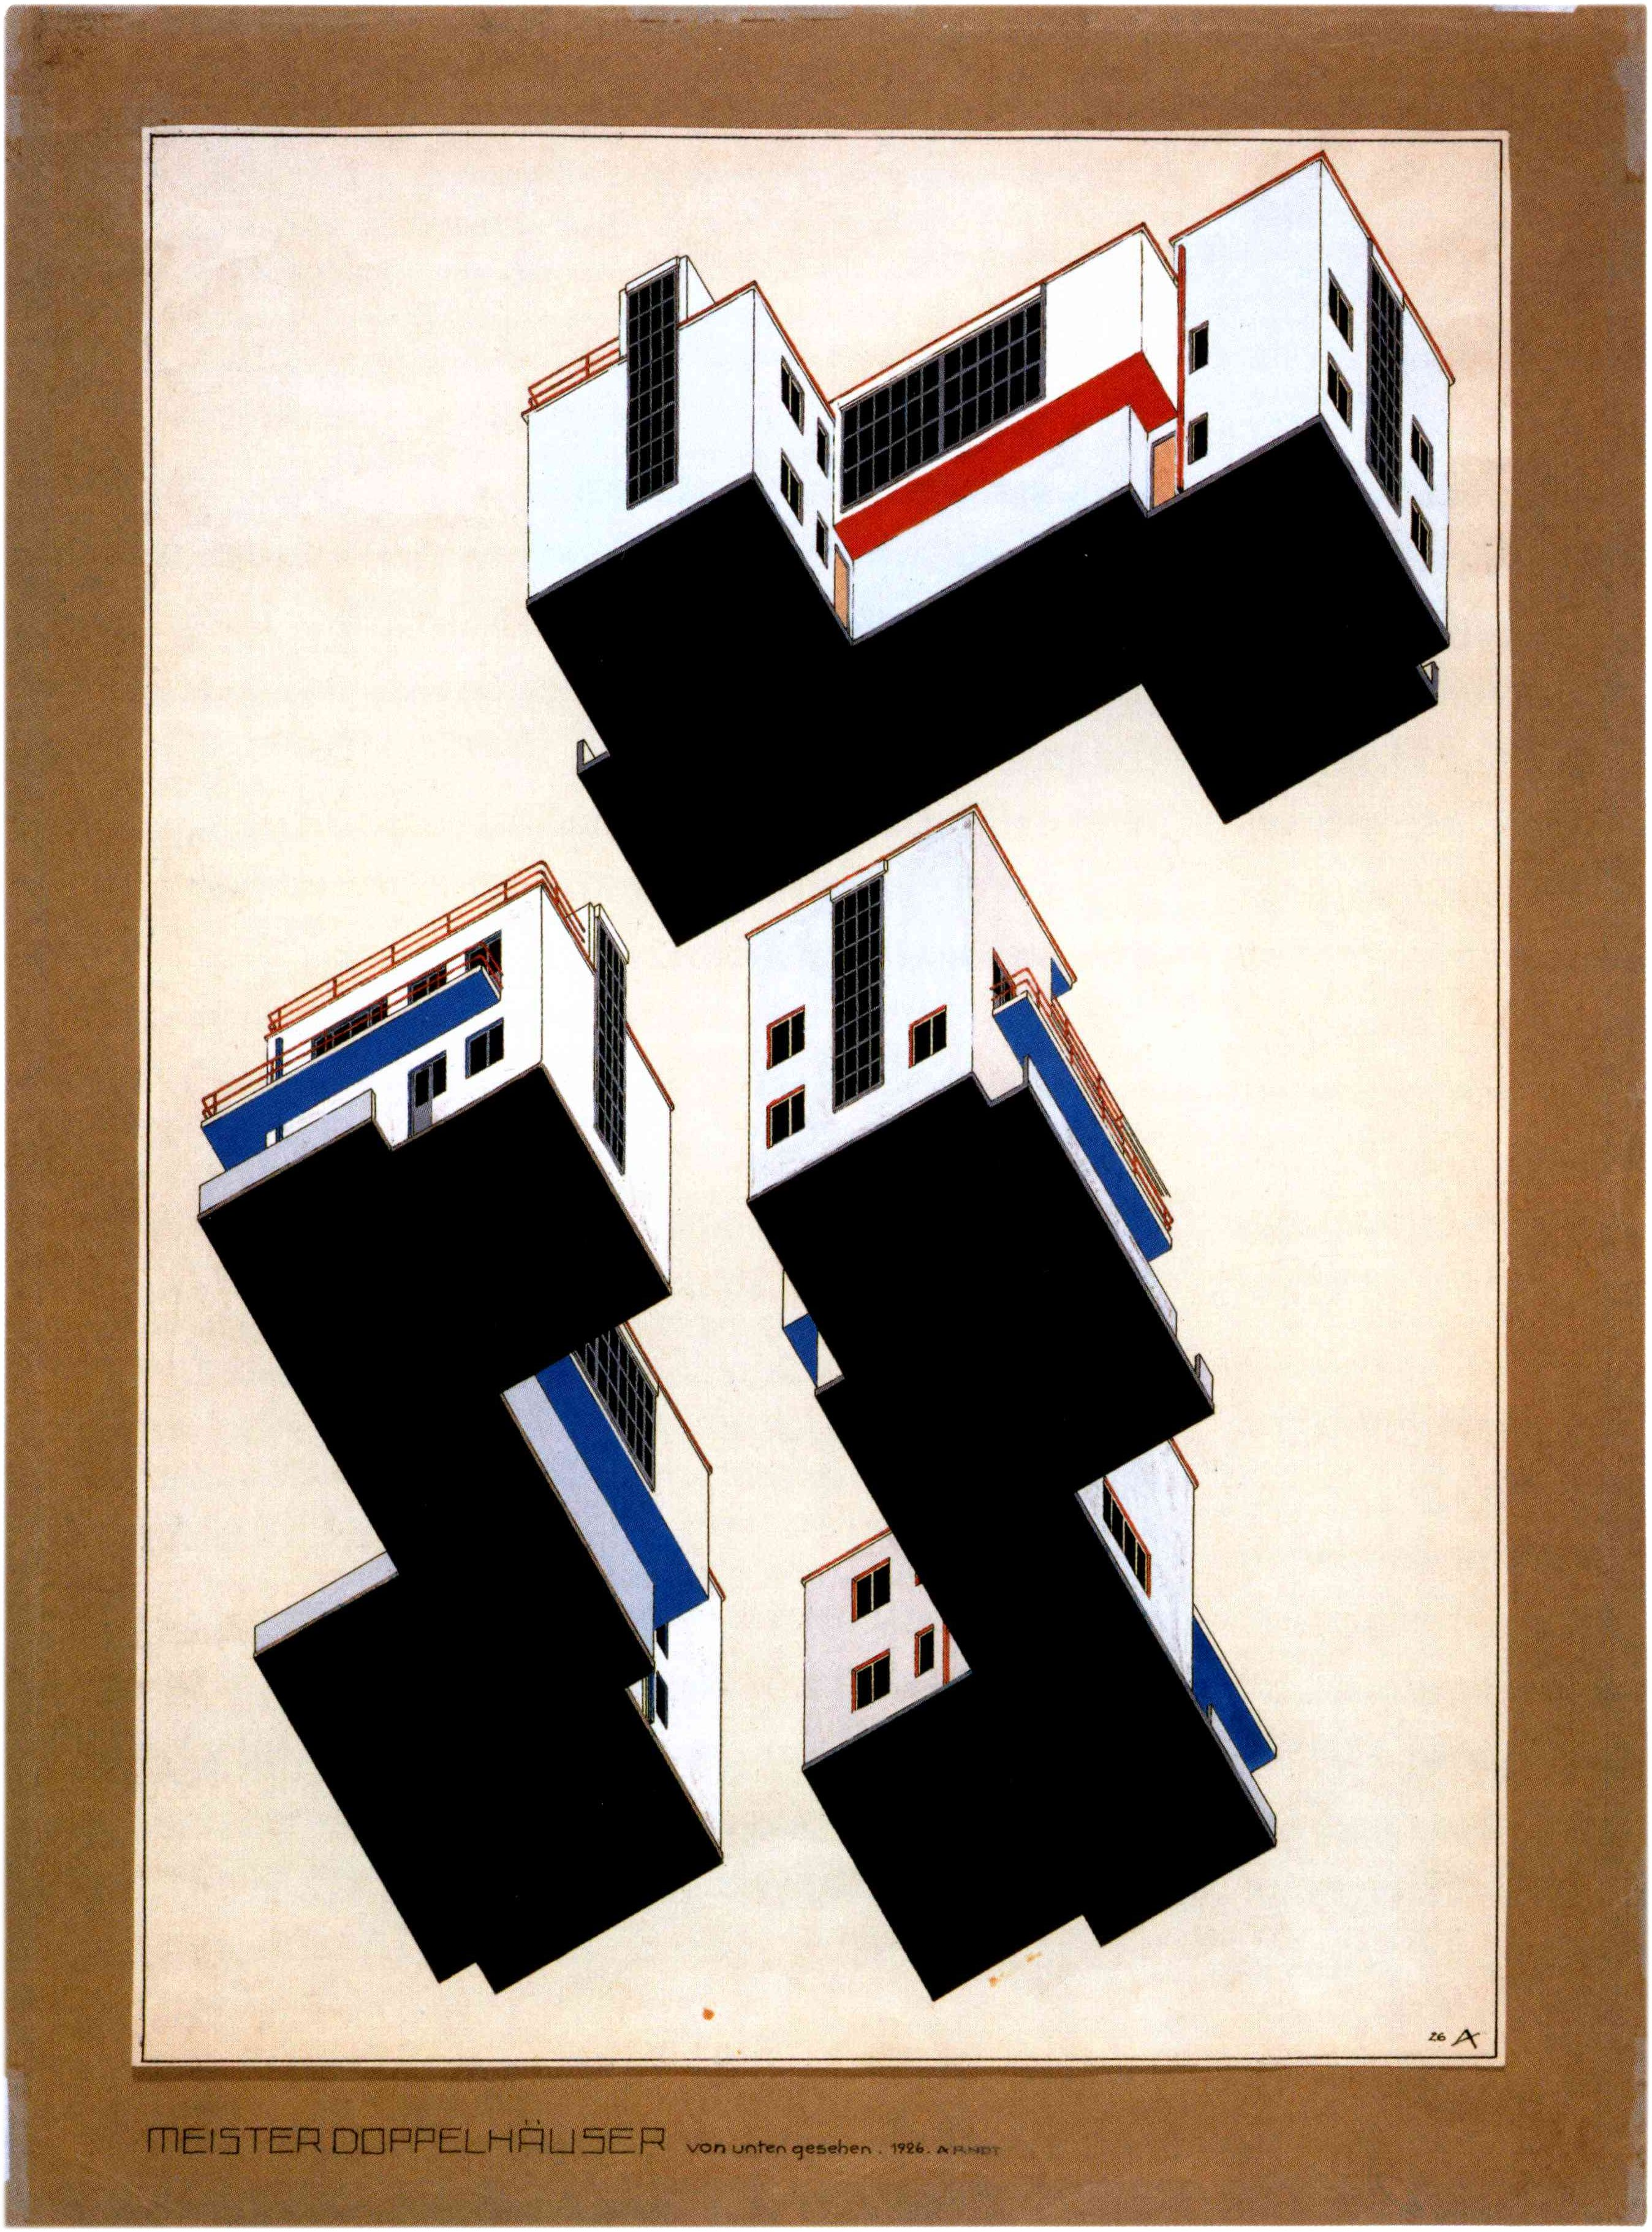 walter gropius houses for the bauhaus sketch axonometric